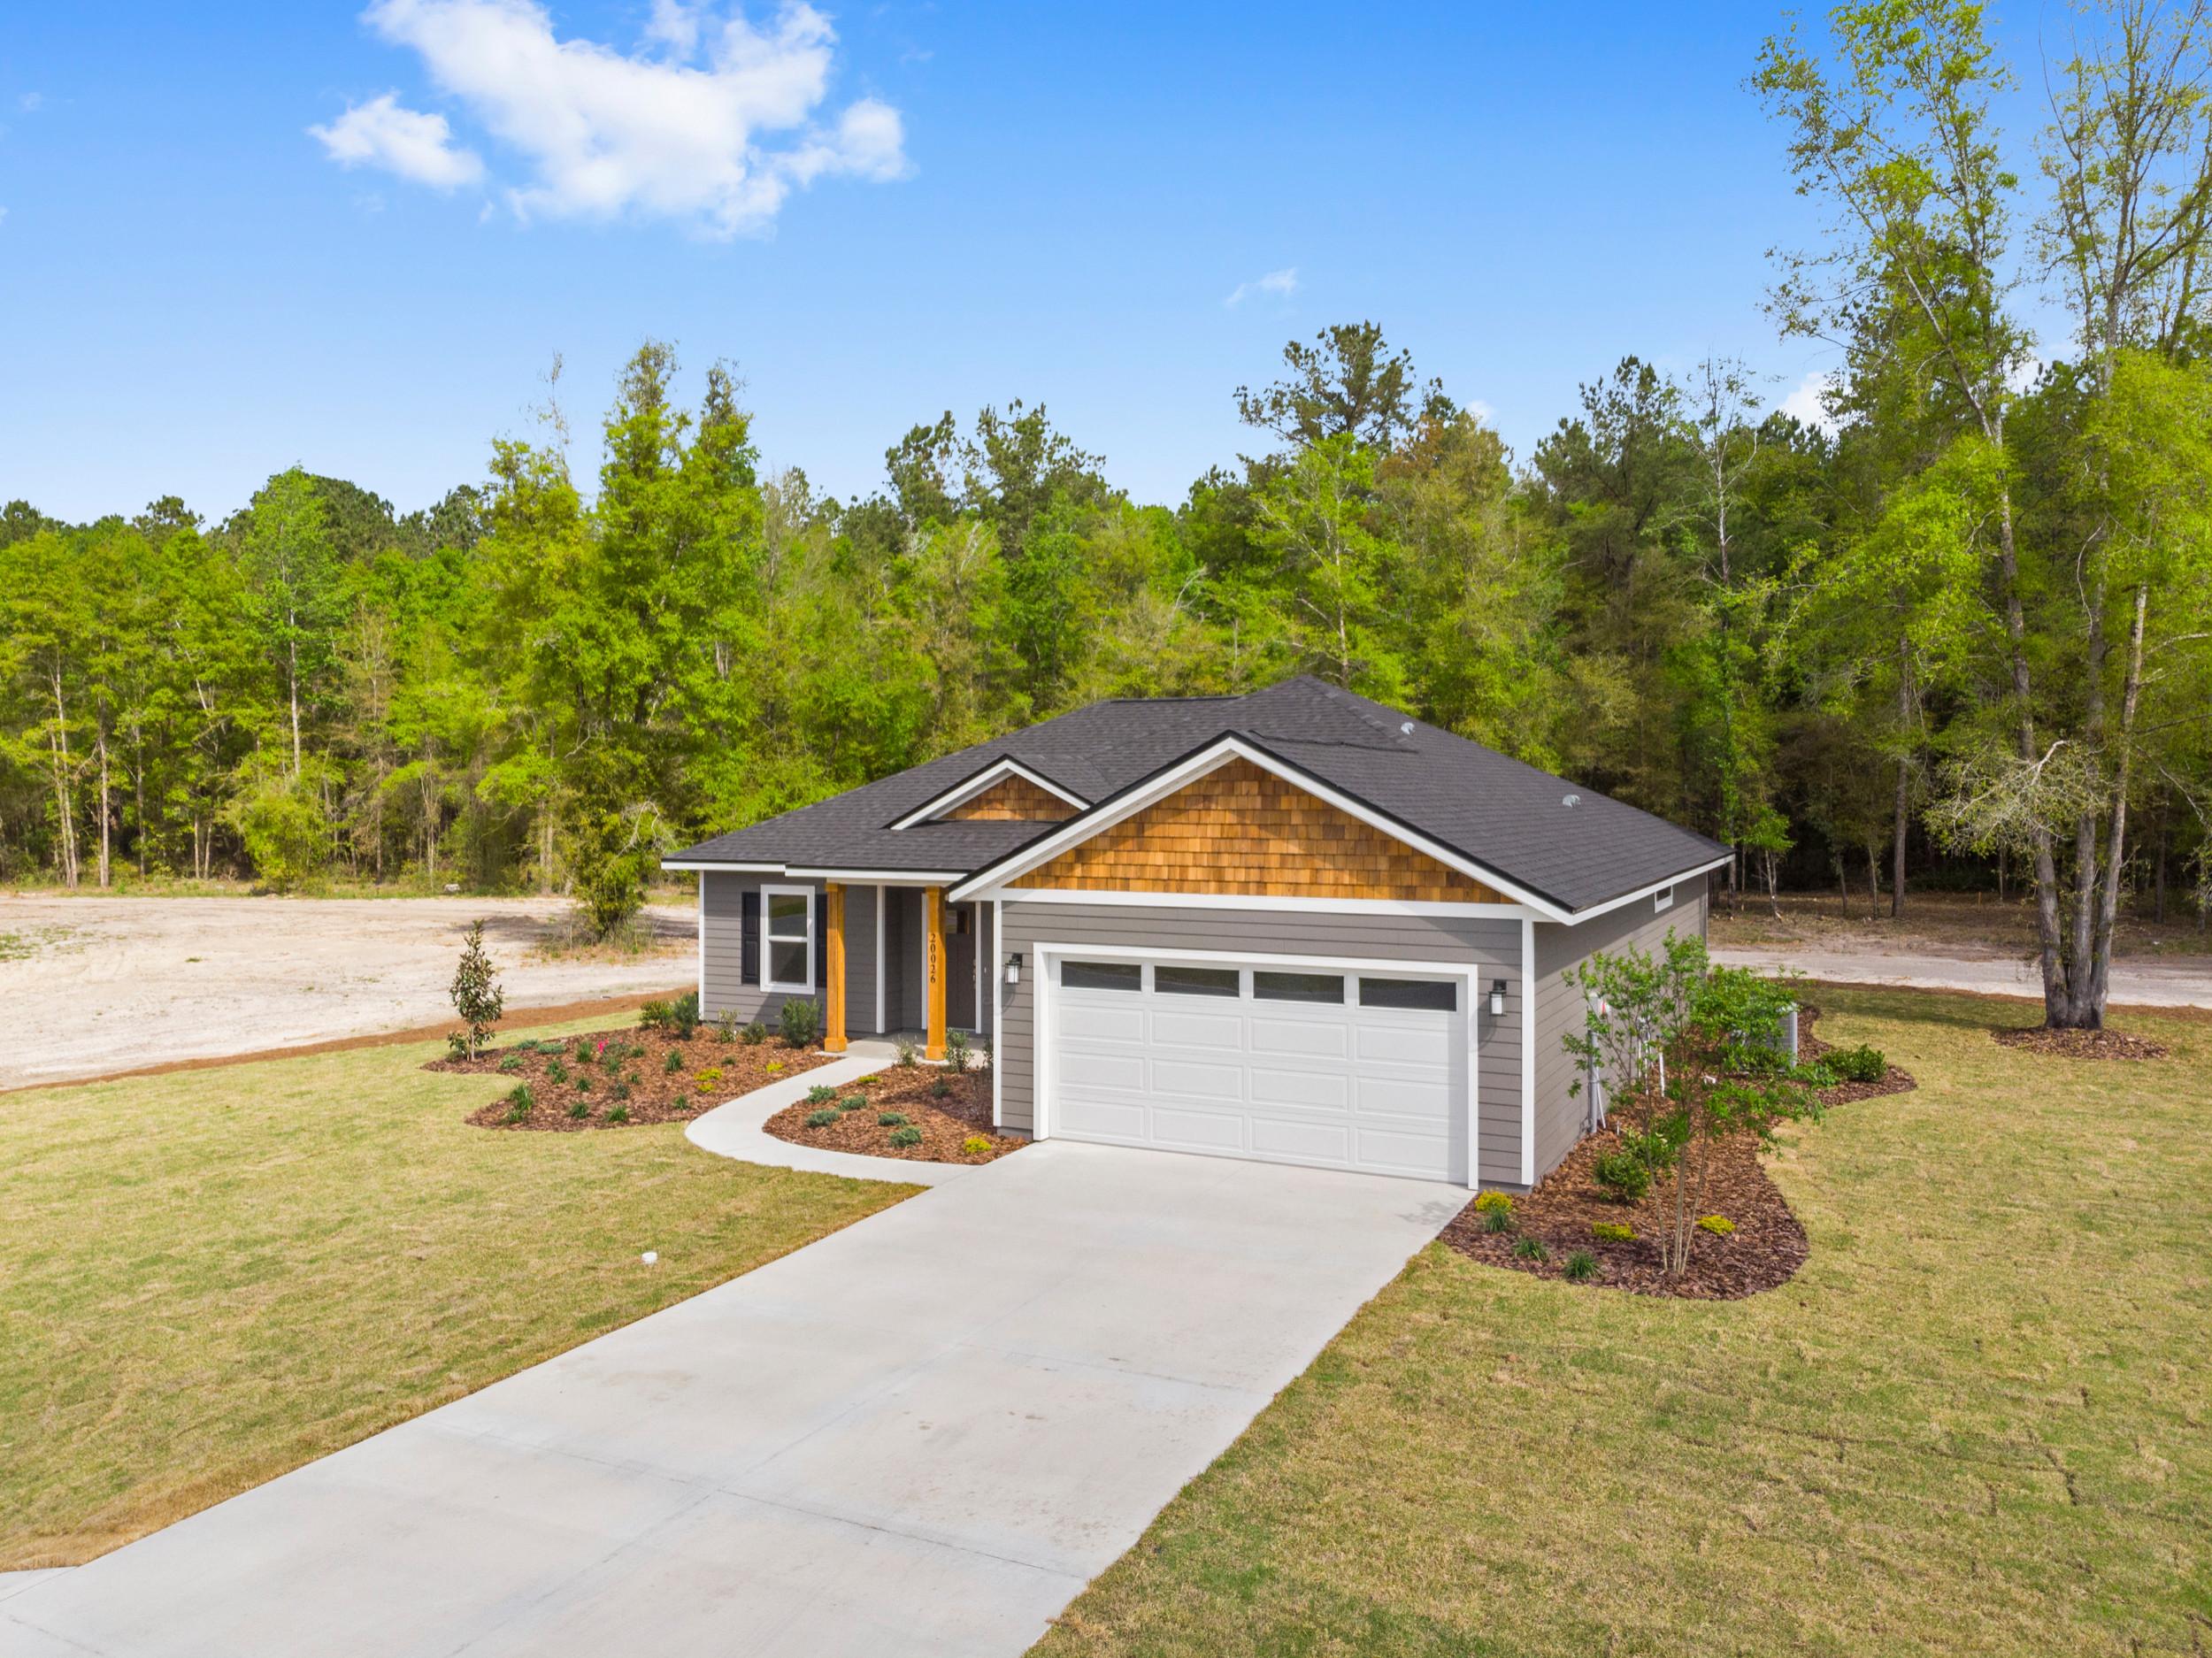 New Home - The Sylvania Model - 1,646